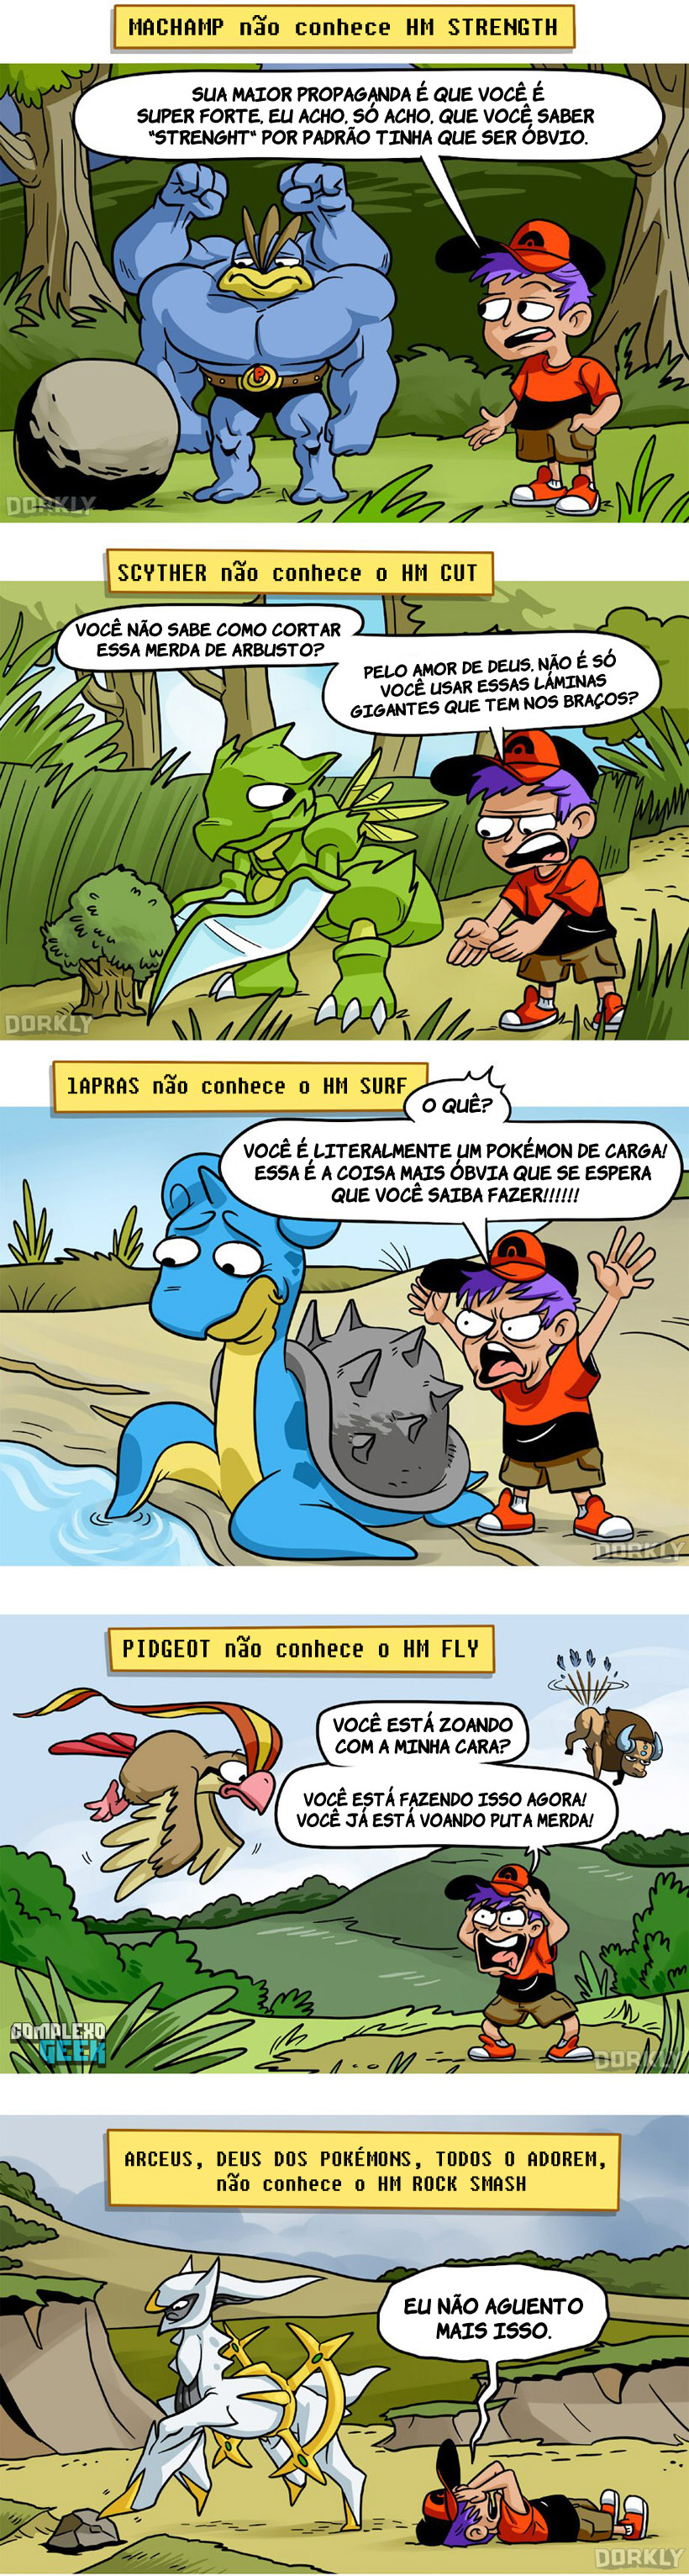 0 HM Pokemon